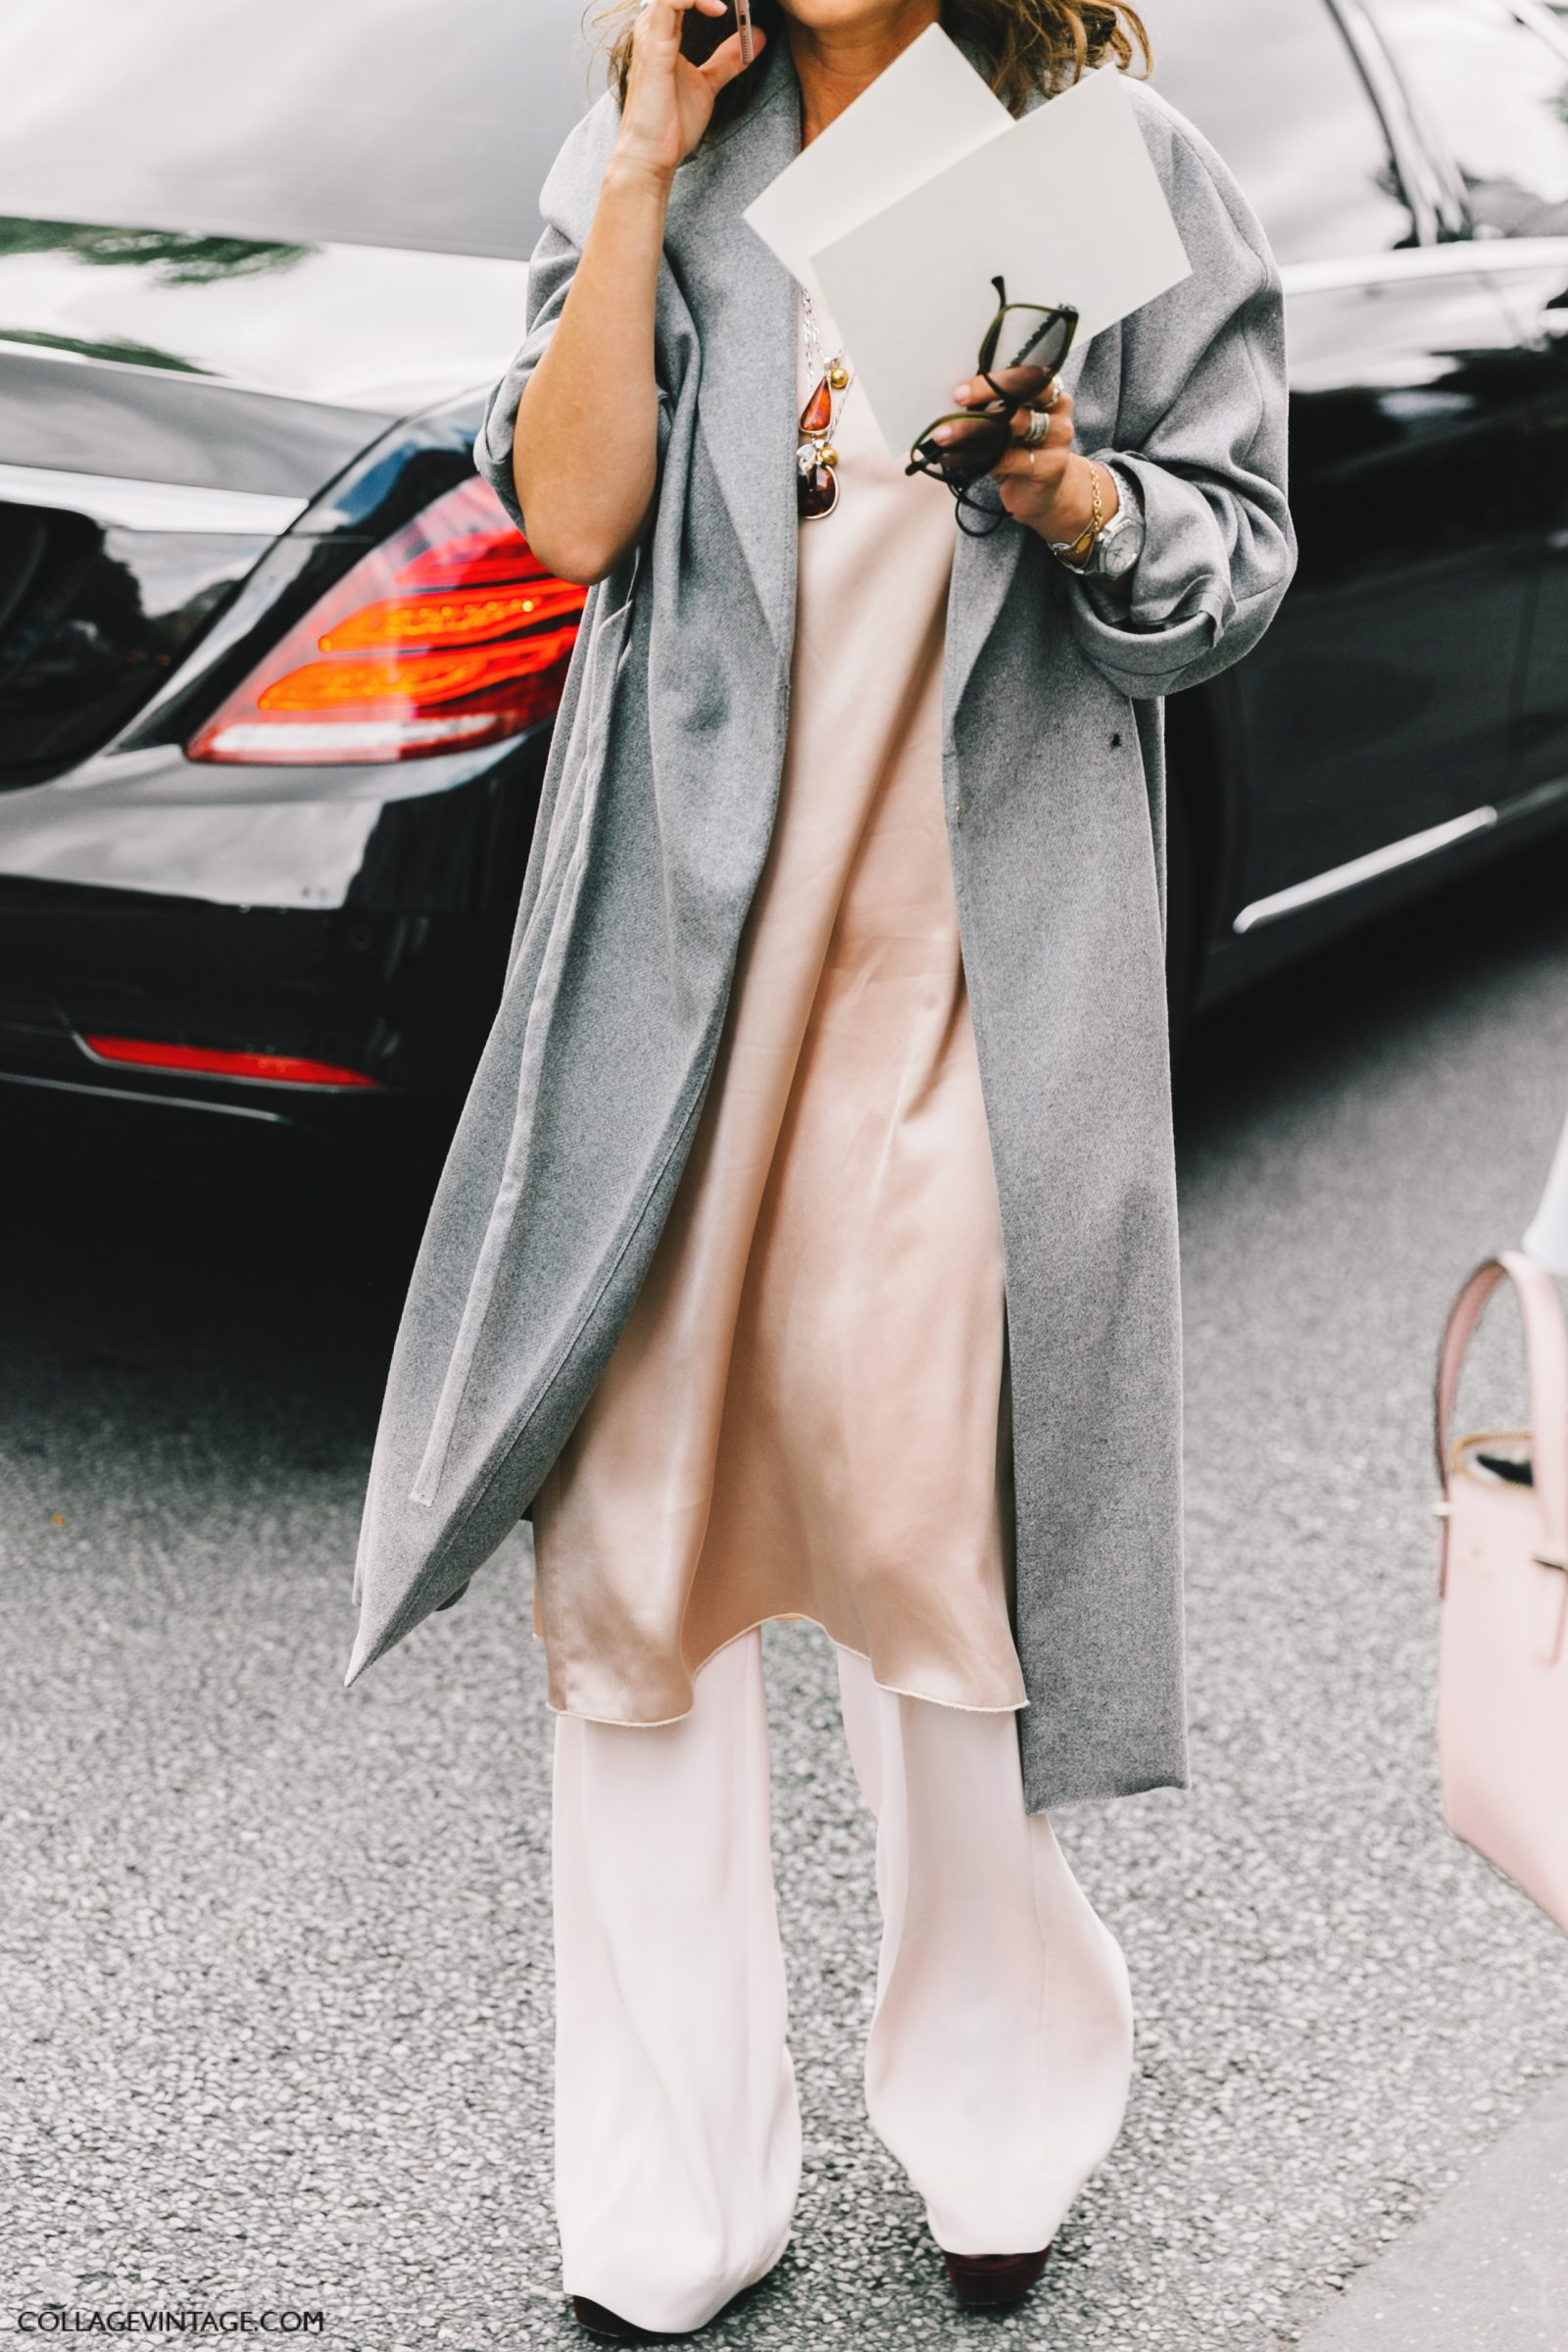 pfw-paris_fashion_week_ss17-street_style-outfits-collage_vintage-rochas-courreges-dries_van_noten-lanvin-guy_laroche-86